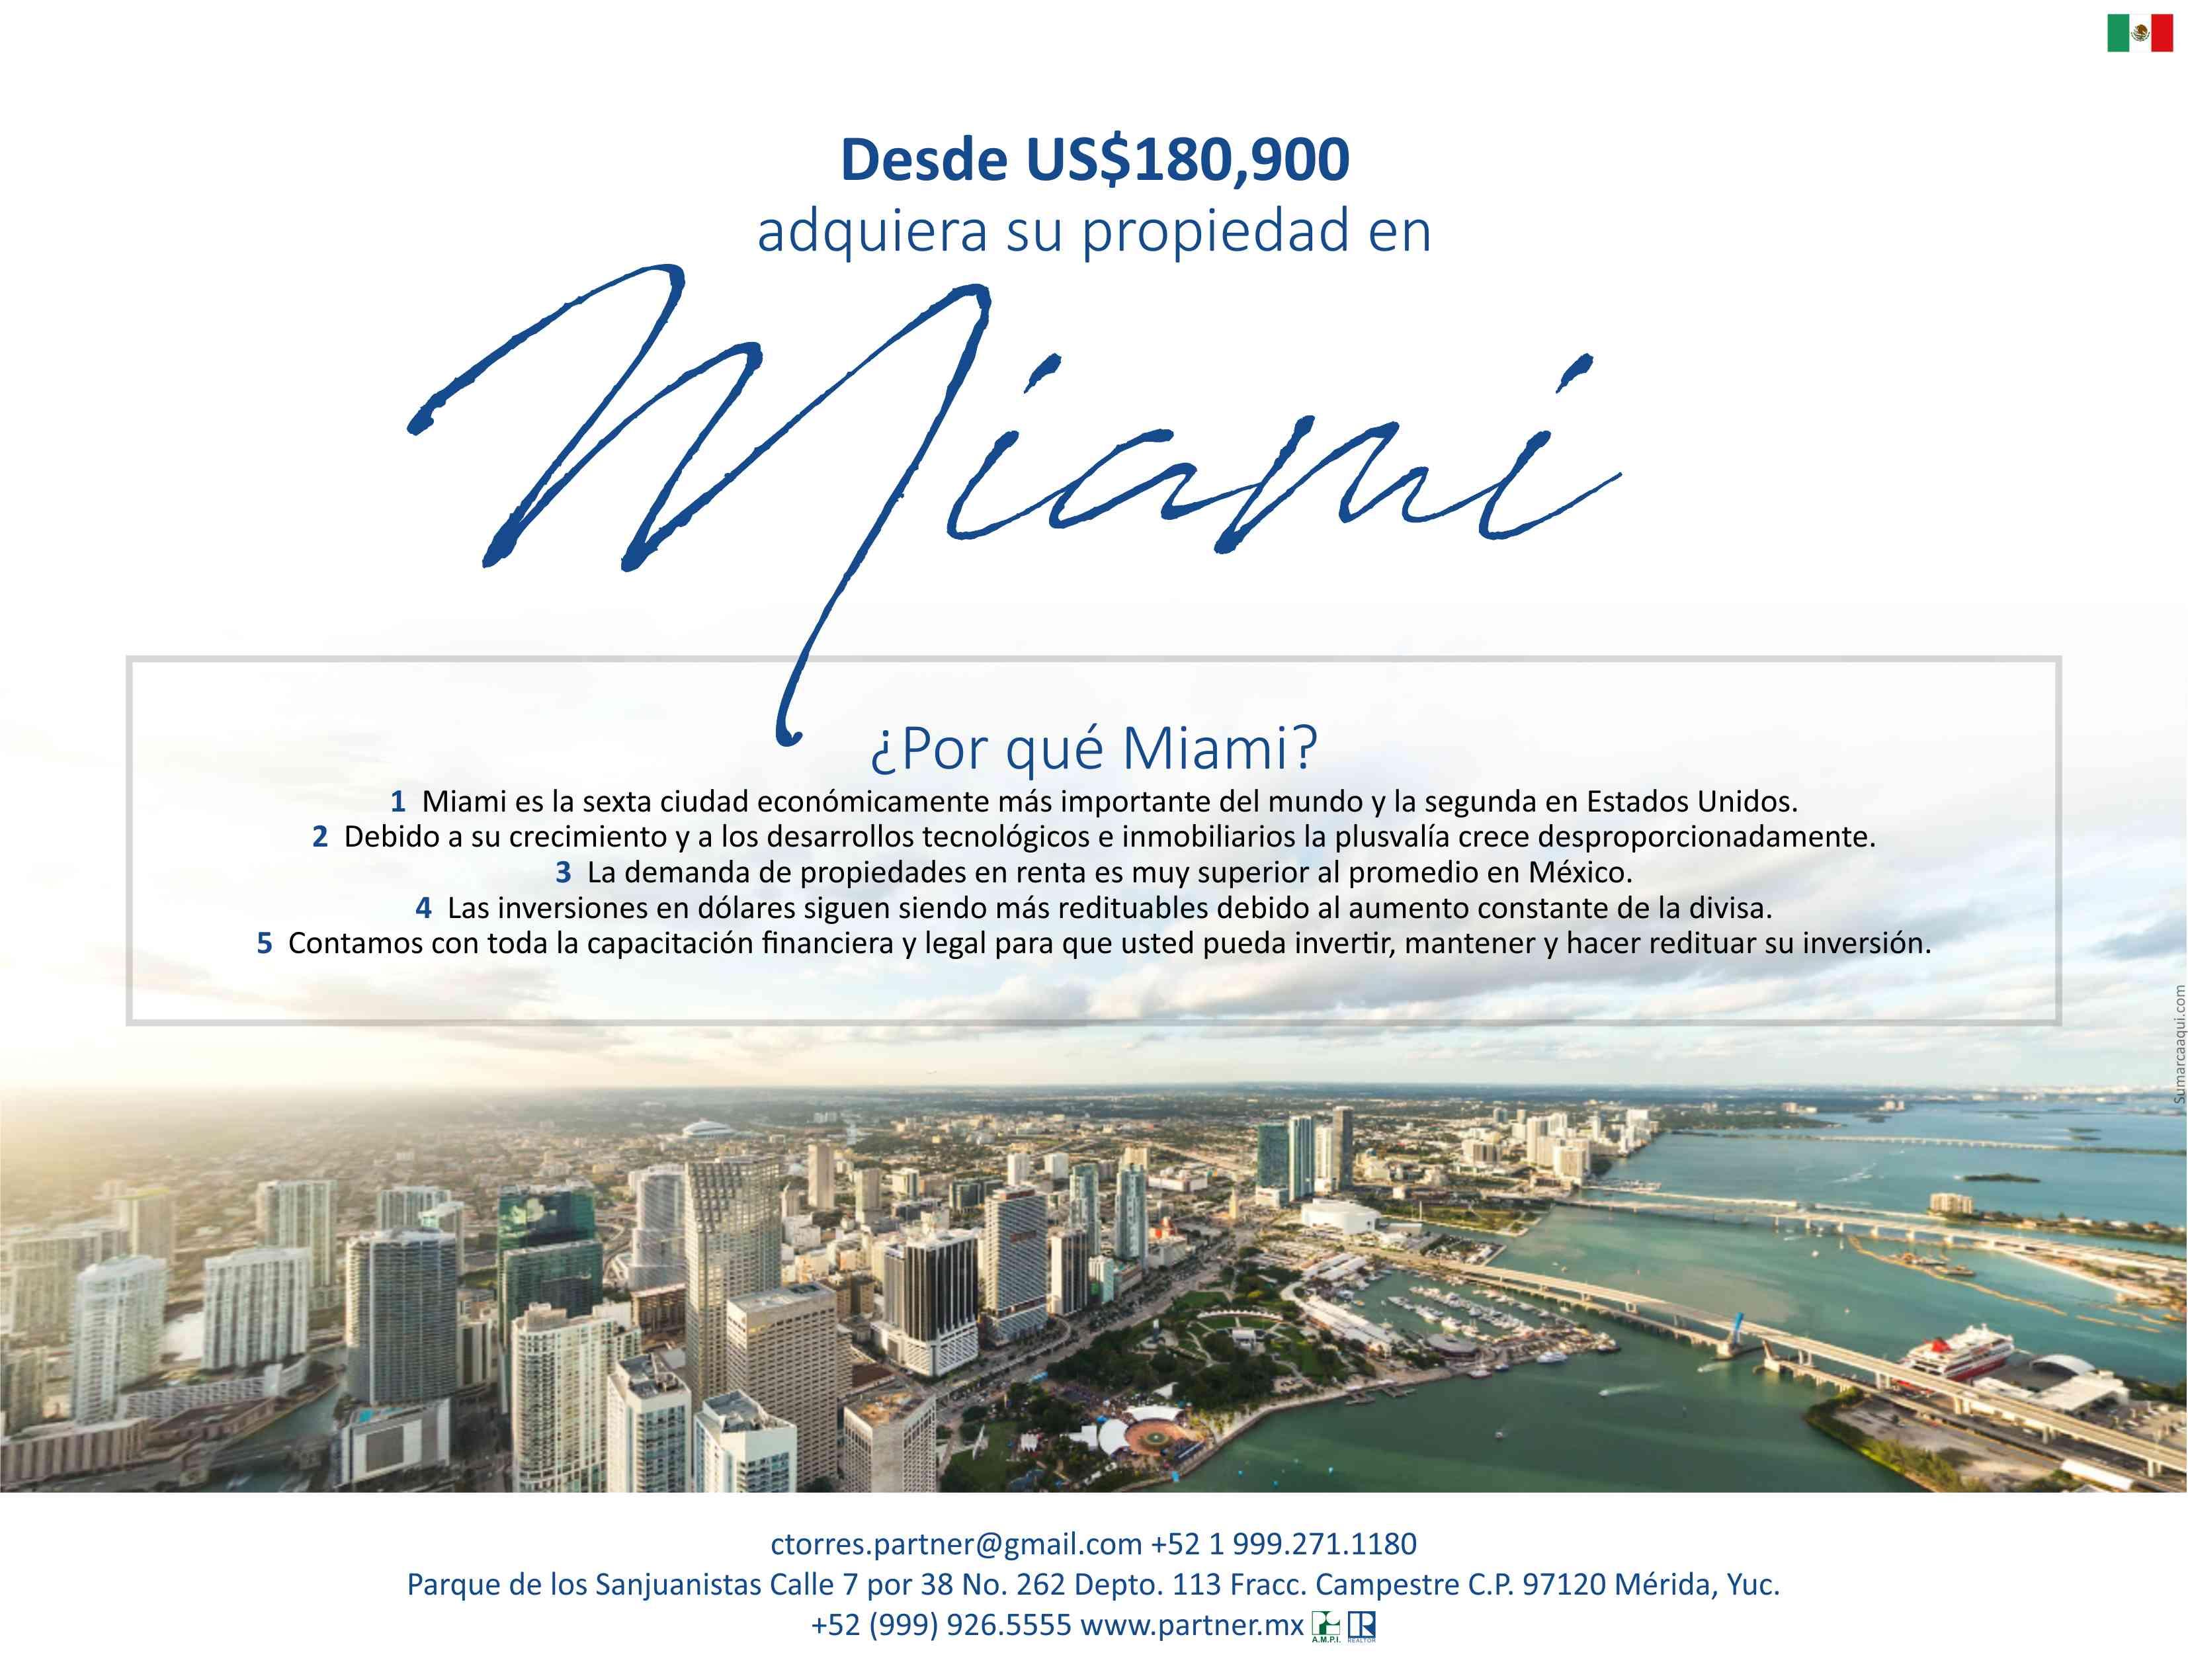 Miami_desde_180_mil.jpg